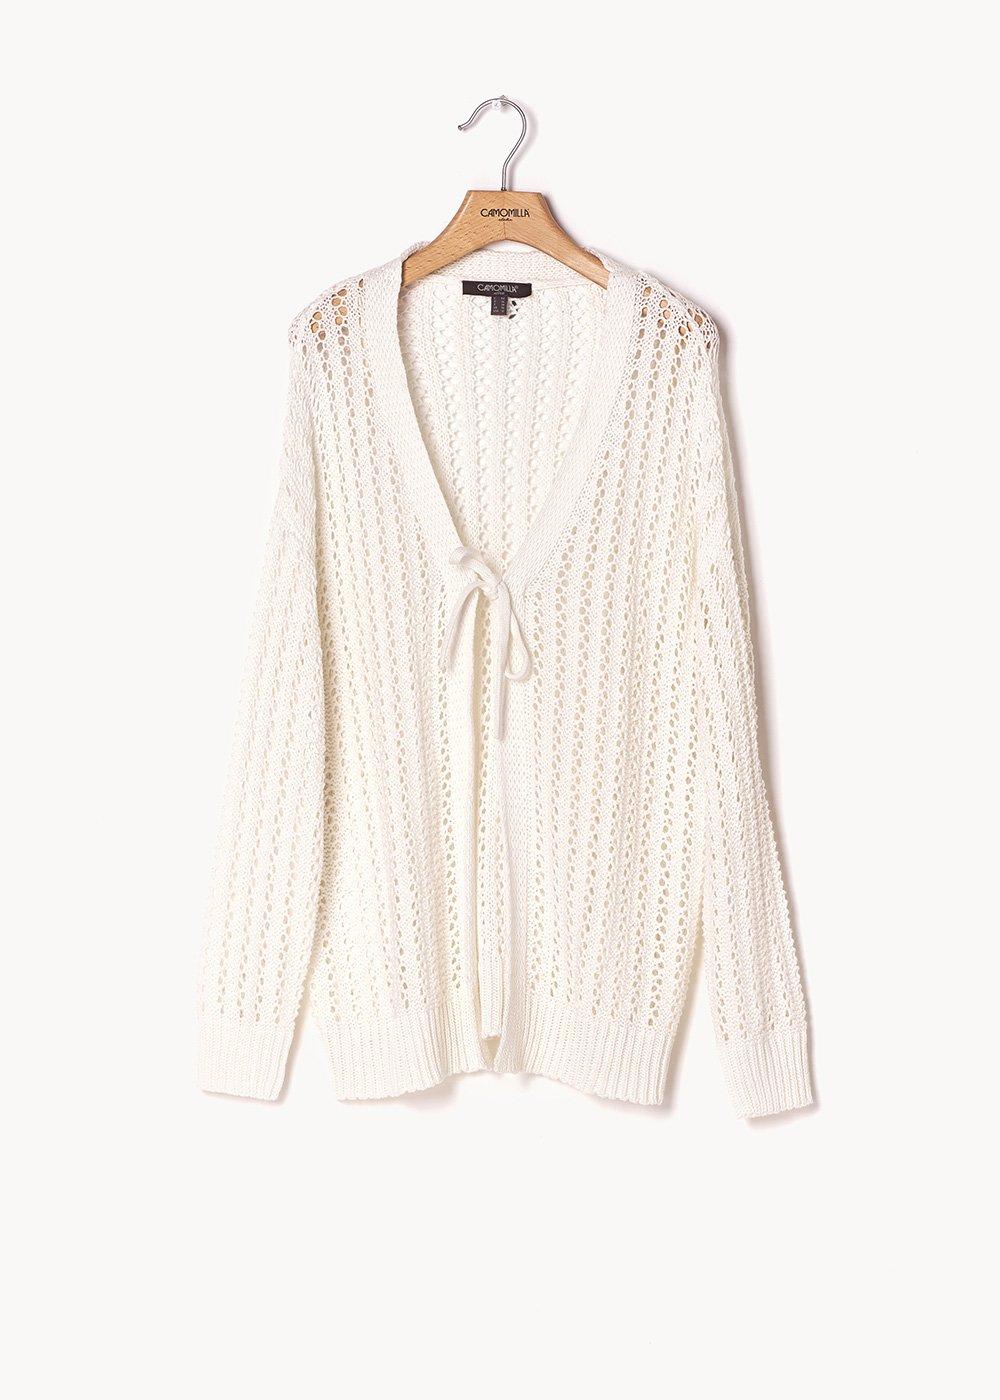 Caddy white openwork cardigan - White - Woman